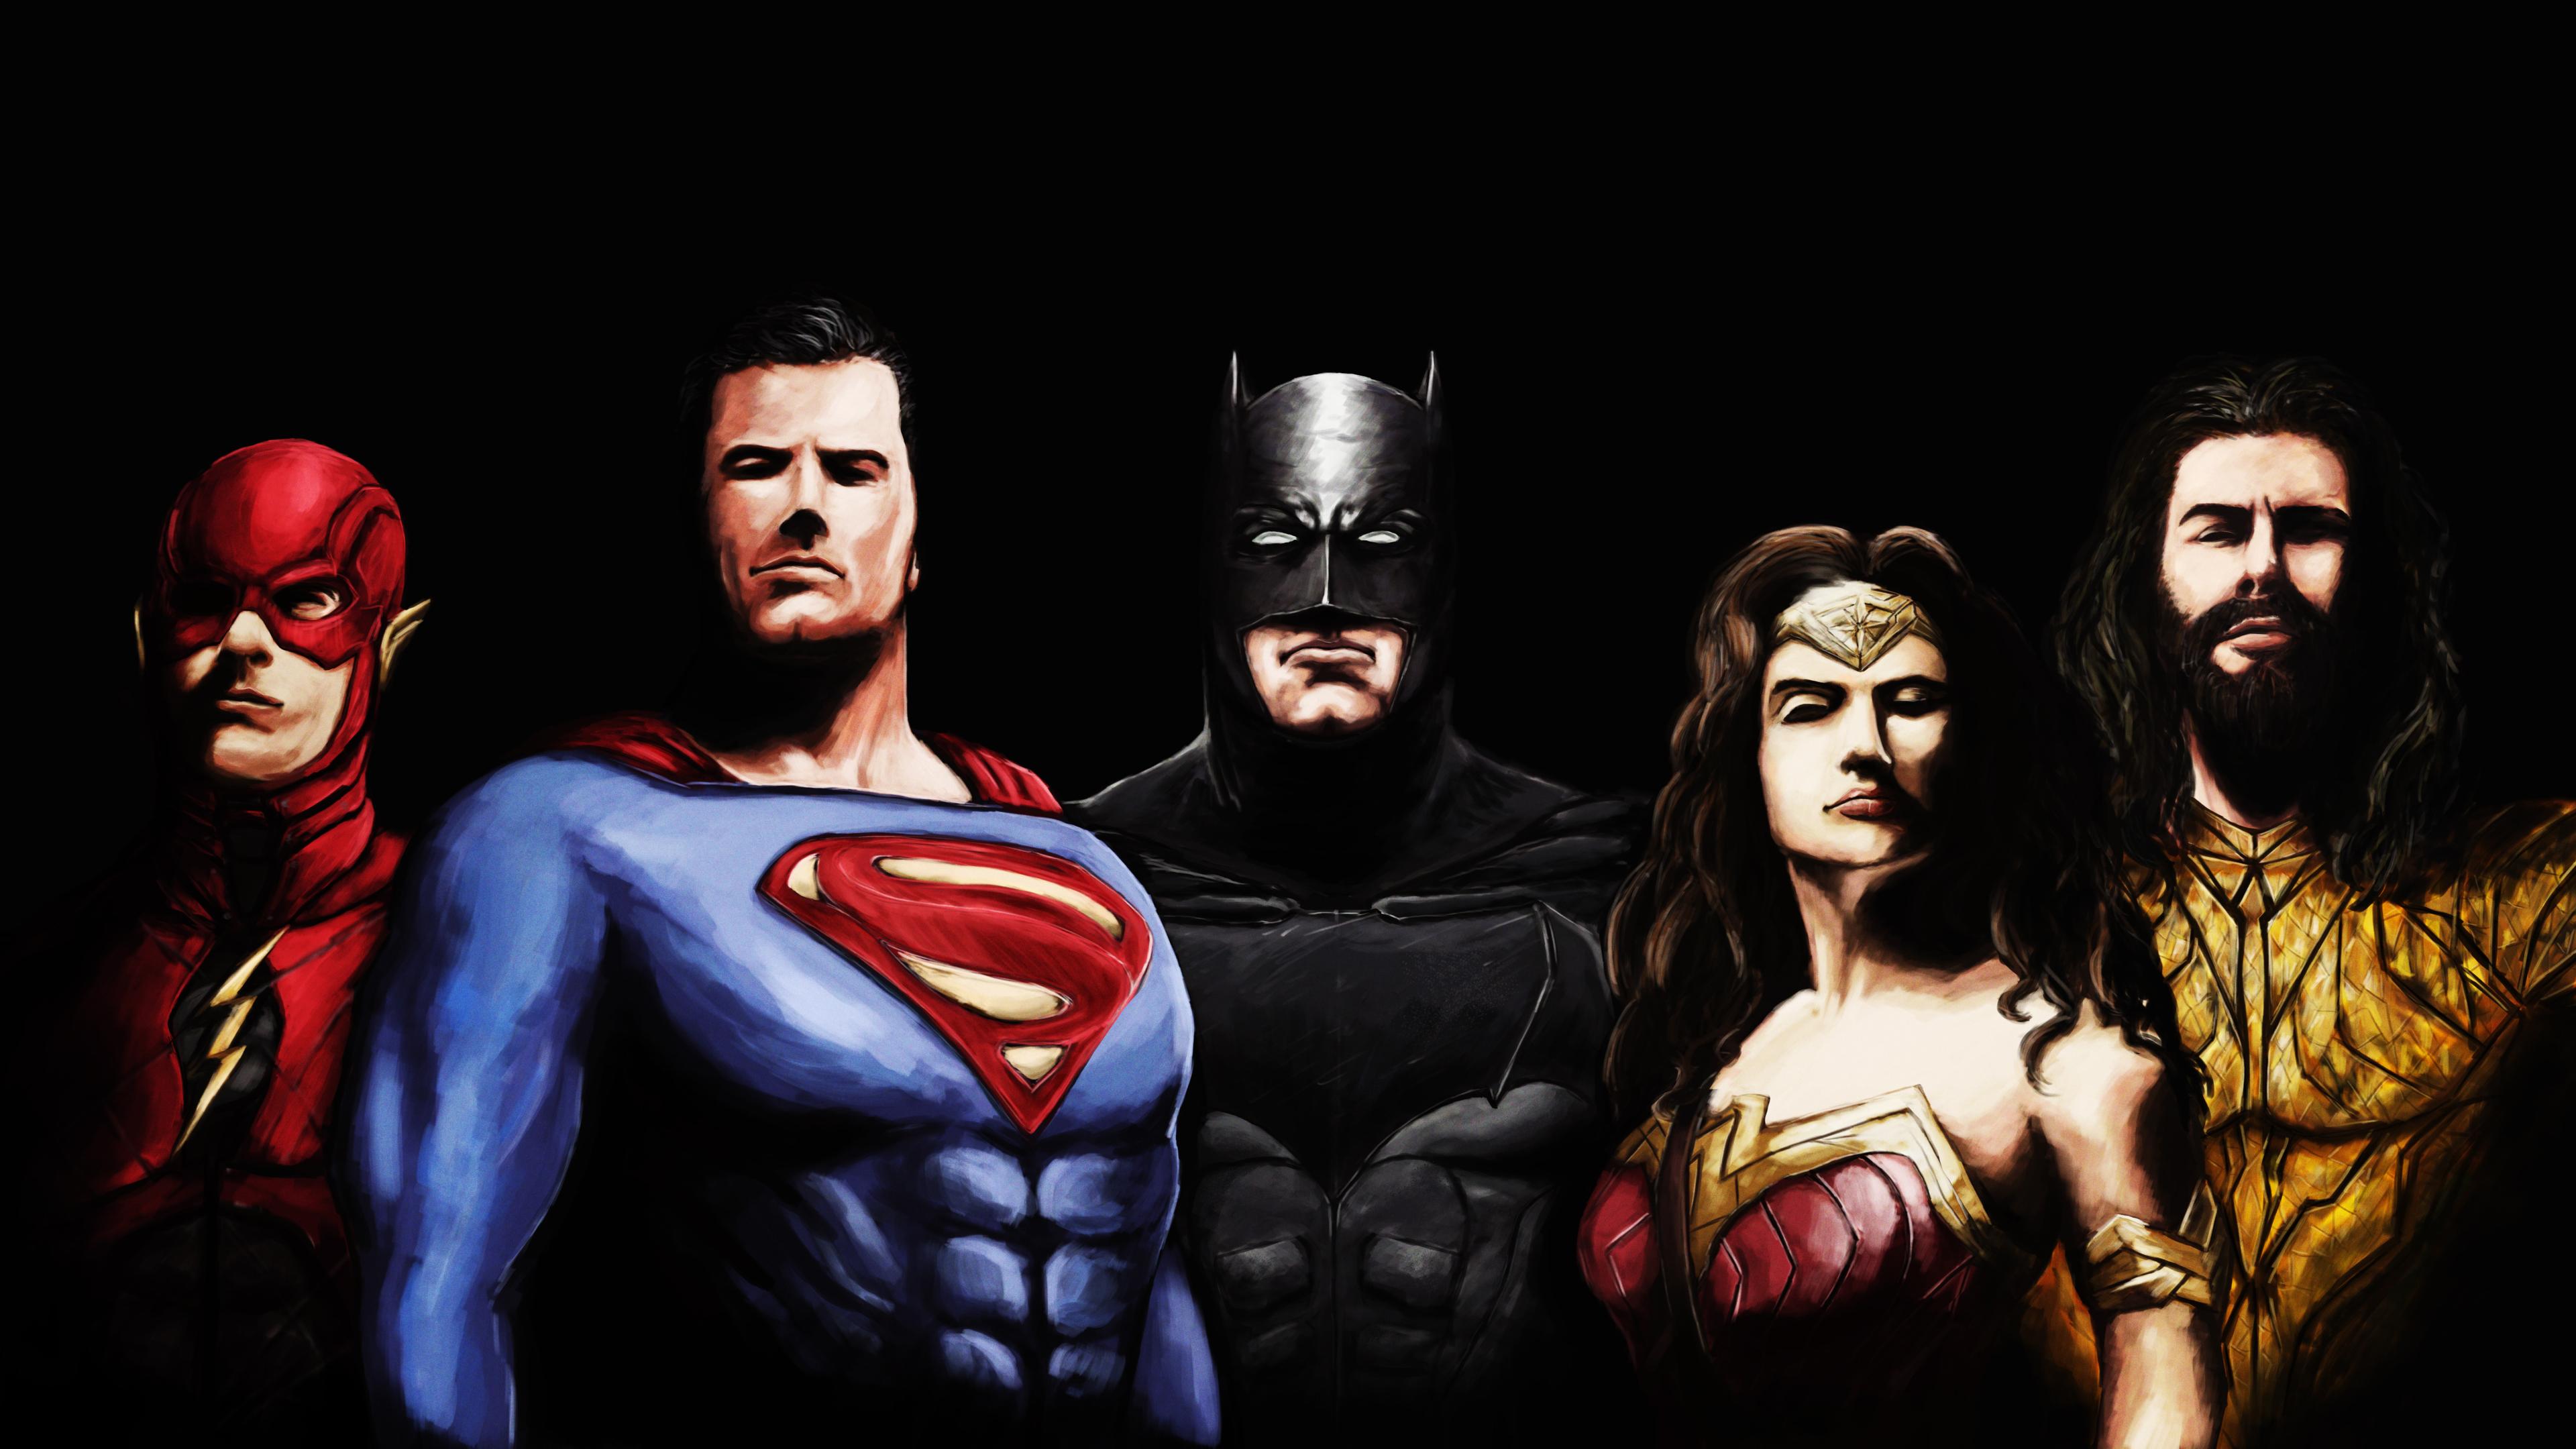 justice league art 4k 1553071393 - Justice League Art 4k - superheroes wallpapers, justice league wallpapers, hd-wallpapers, digital art wallpapers, deviantart wallpapers, artwork wallpapers, 4k-wallpapers